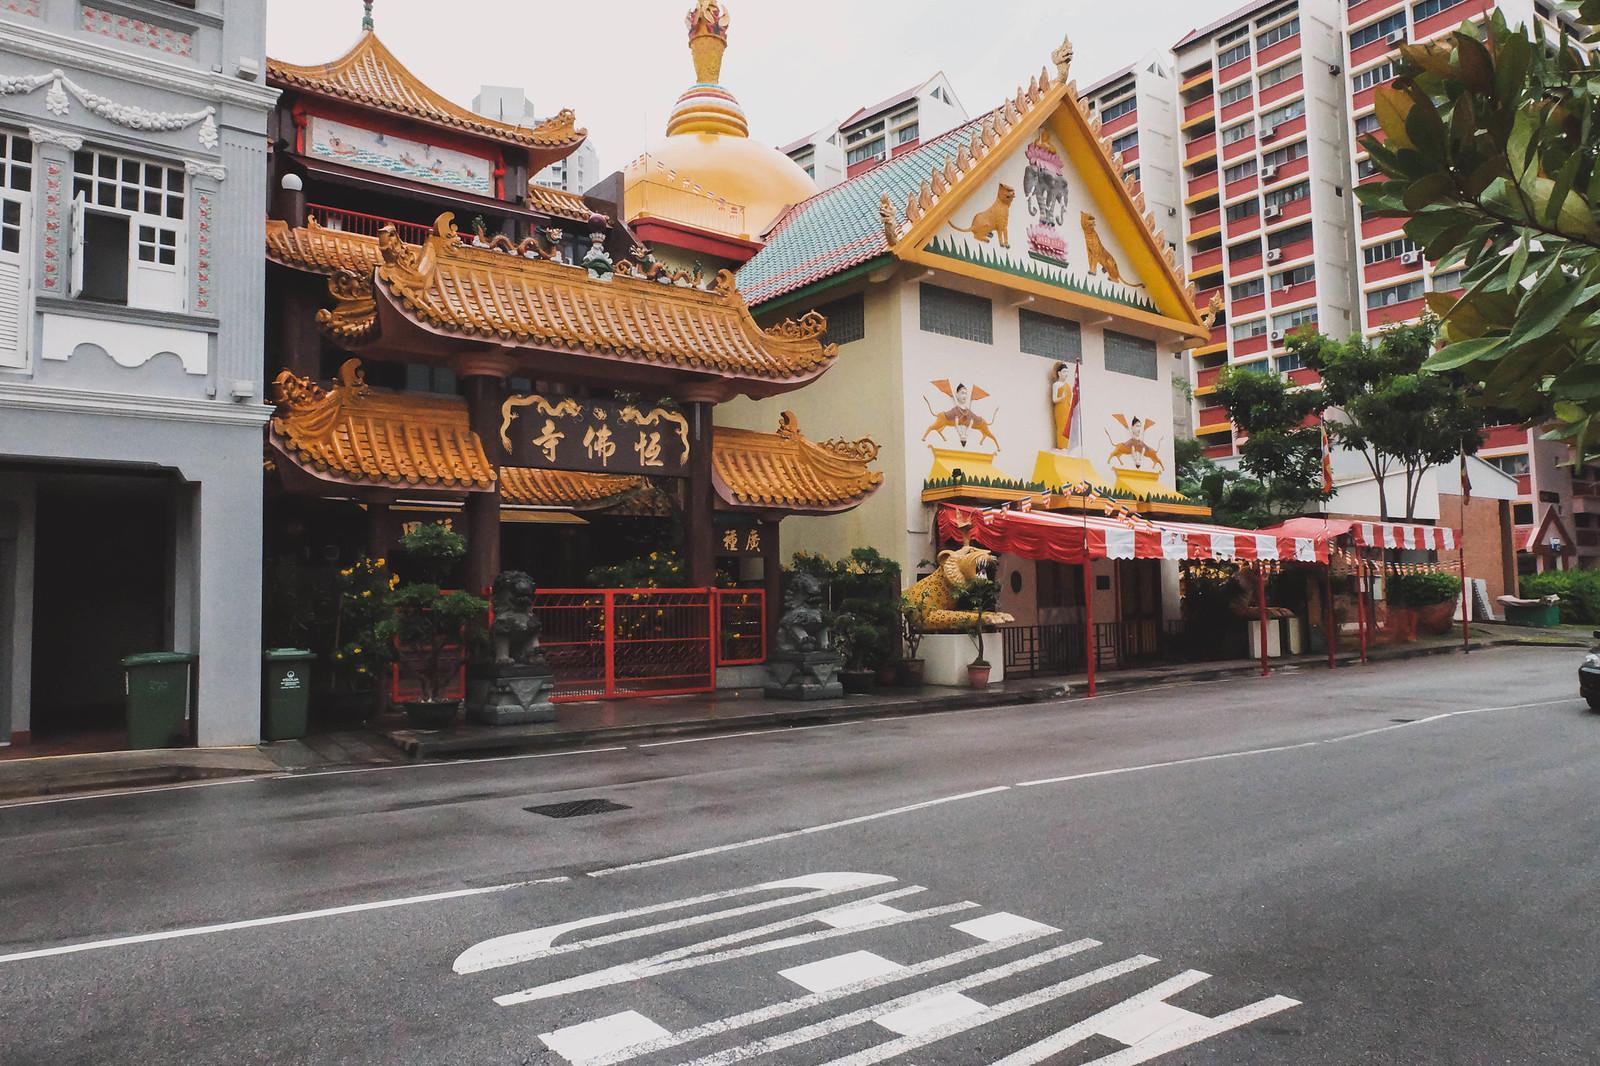 sakya muni buddha temple farrer park singapore